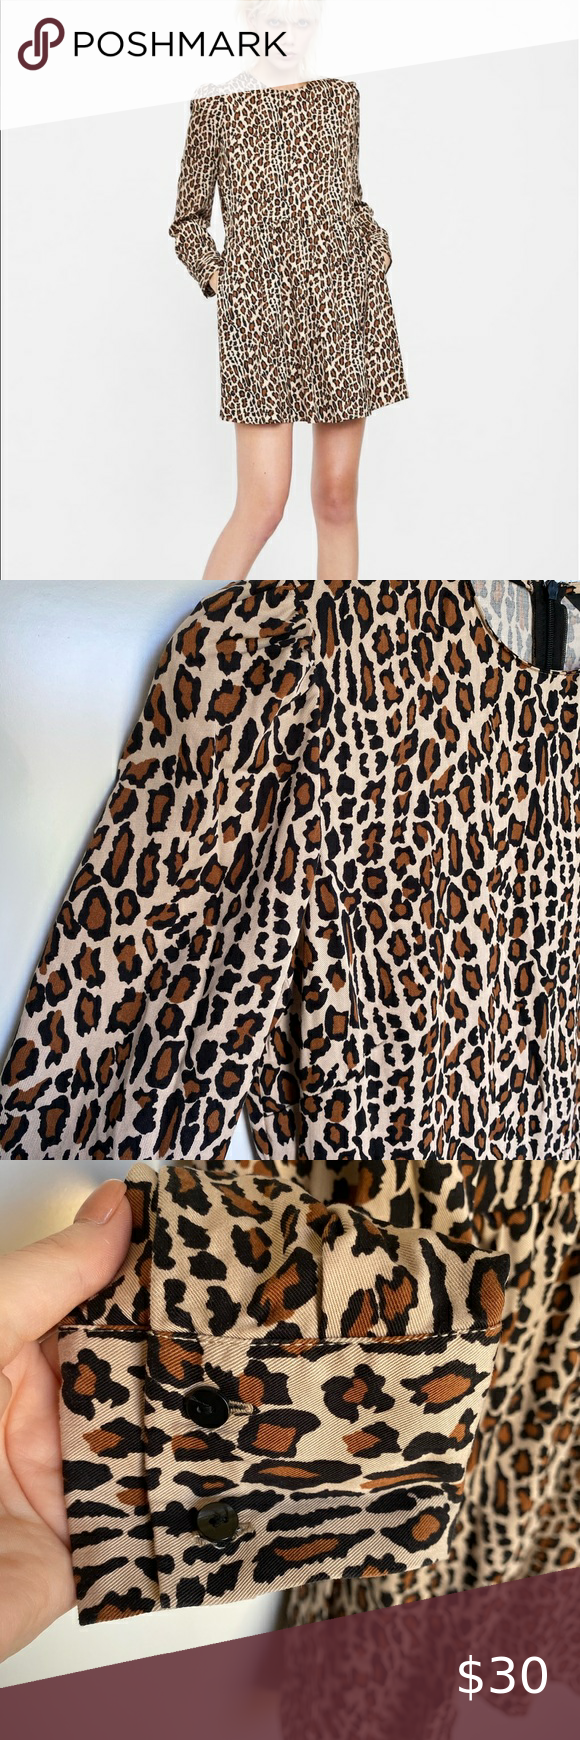 Zara Cheetah Print Long Sleeve Dress Long Sleeve Print Dress Long Sleeve Dress Animal Print Dresses [ 1740 x 580 Pixel ]